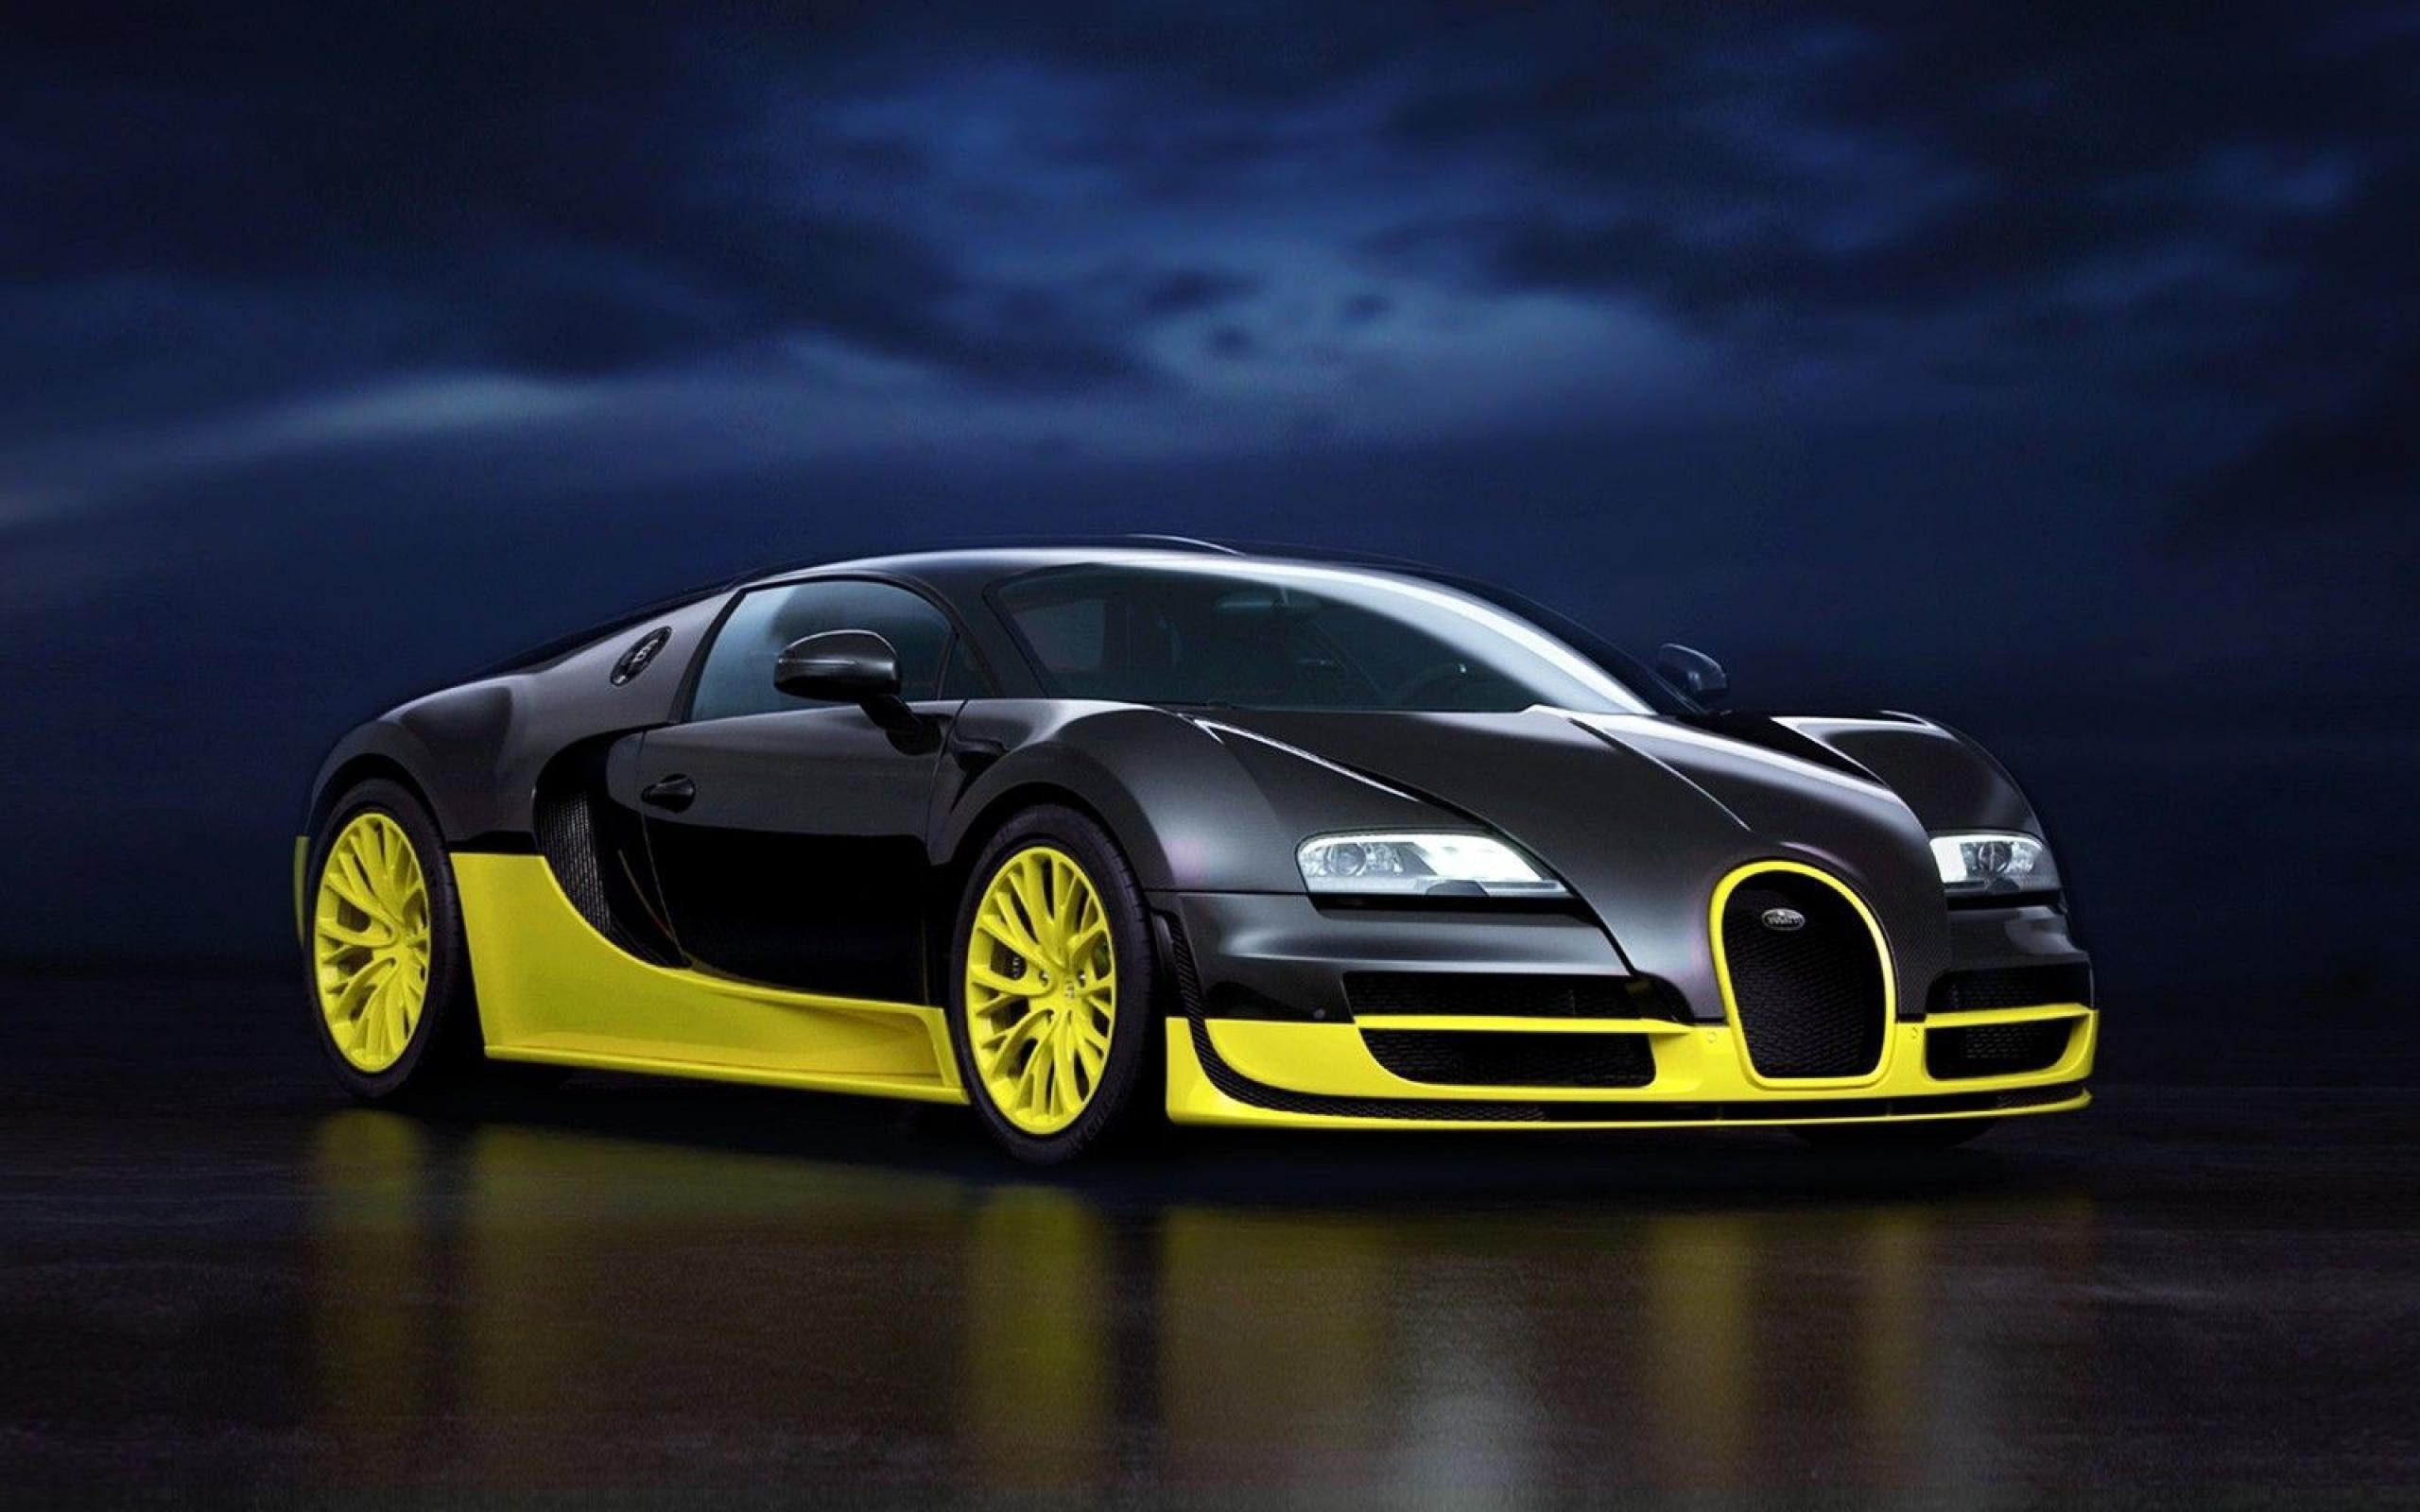 Bugatti veyron wallpaper for desktop - photo#4